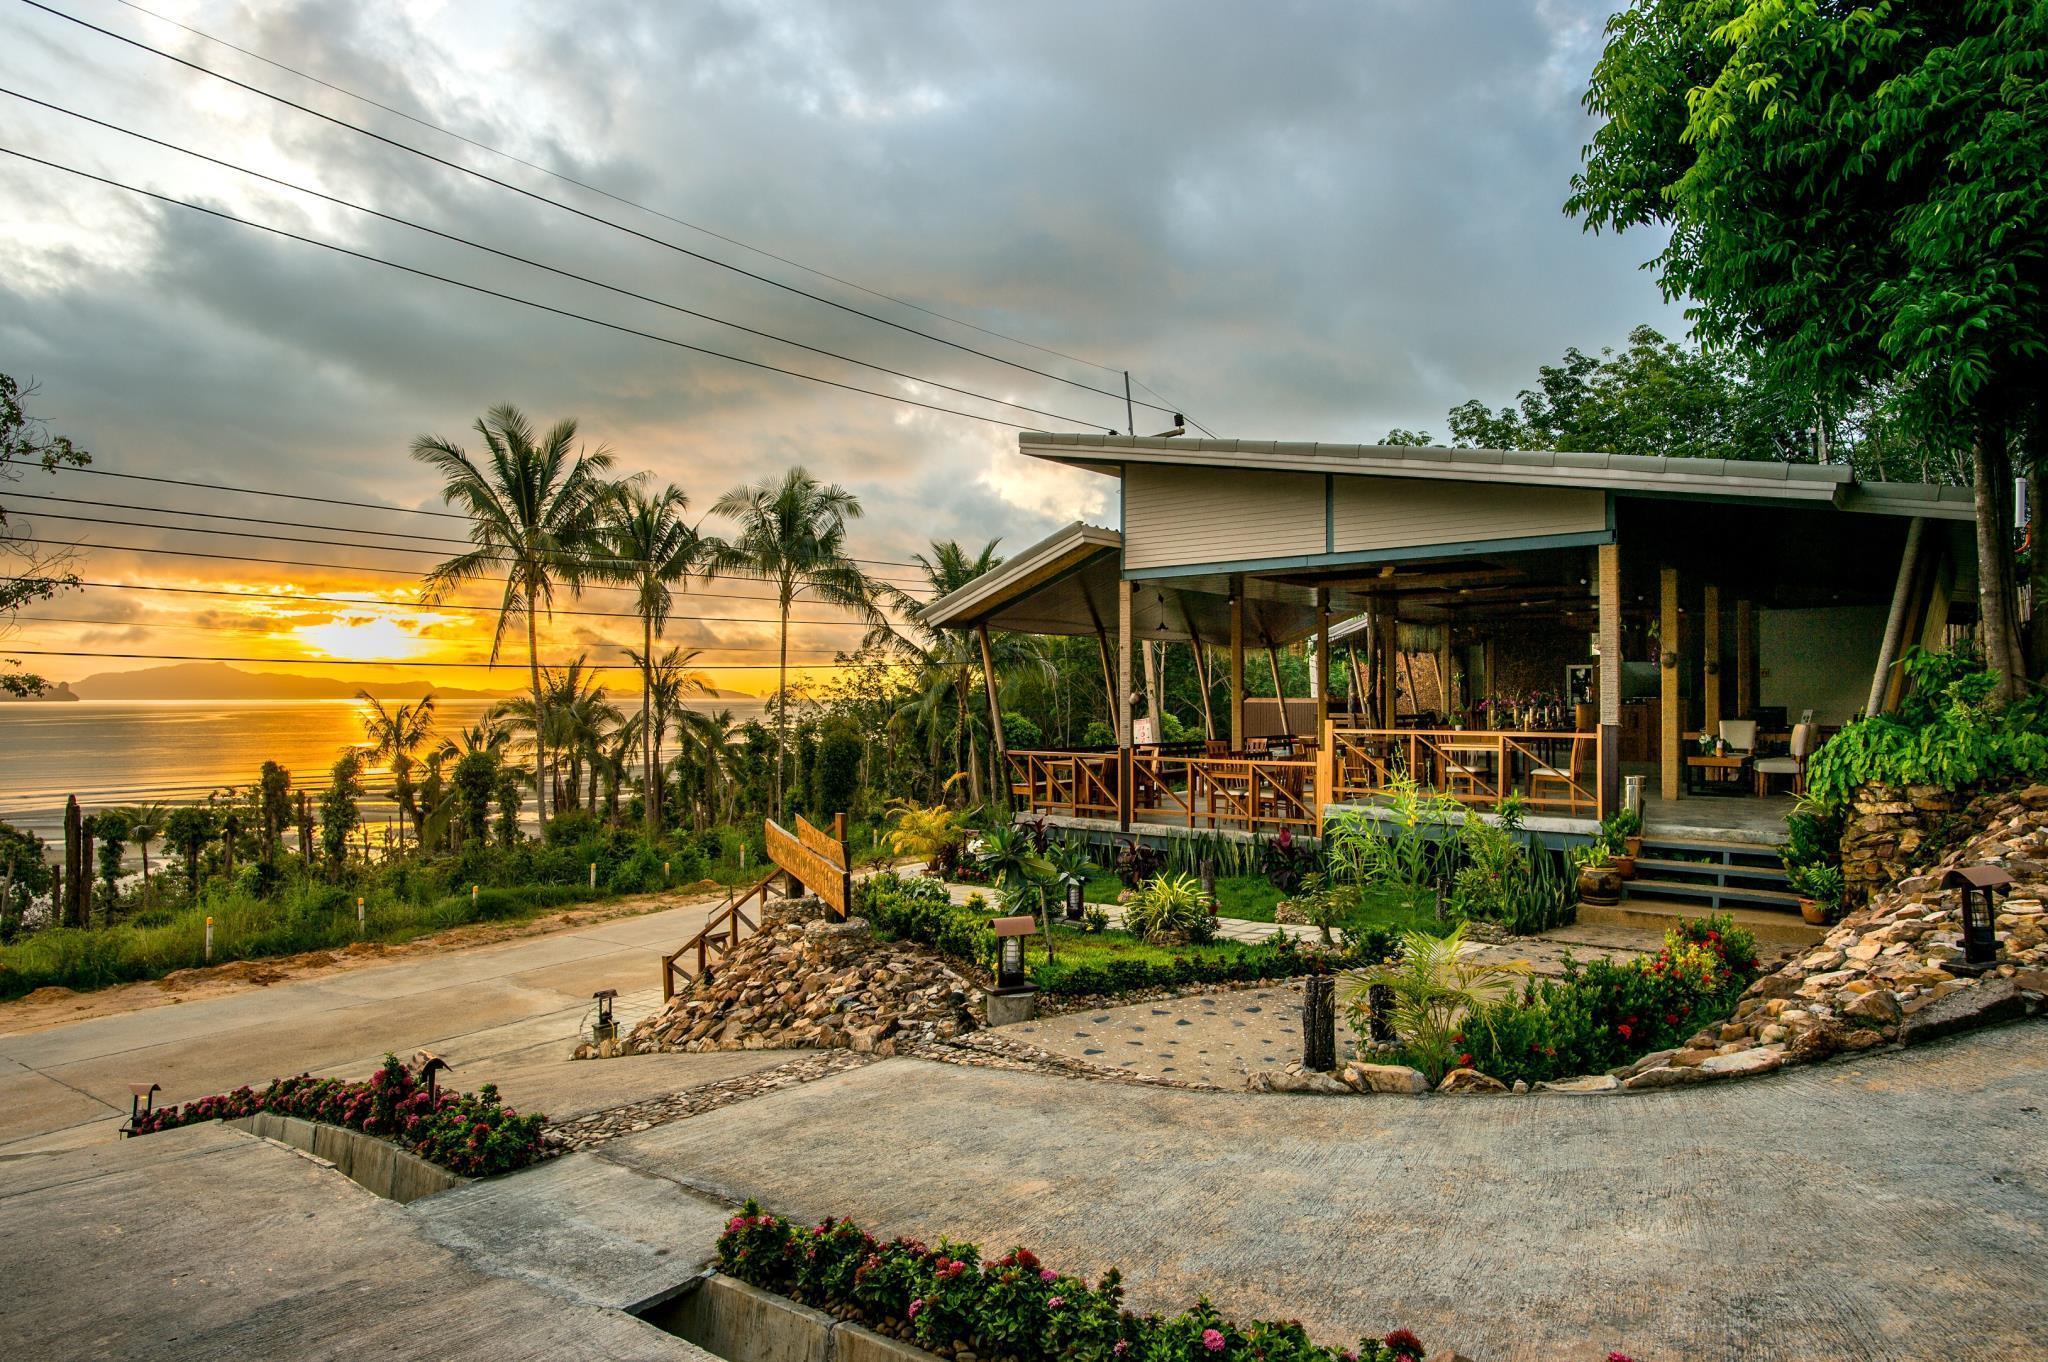 Koh Yao Yai Hillside Resort เกาะยาวใหญ่ ฮิลล์ไซด์ รีสอร์ท